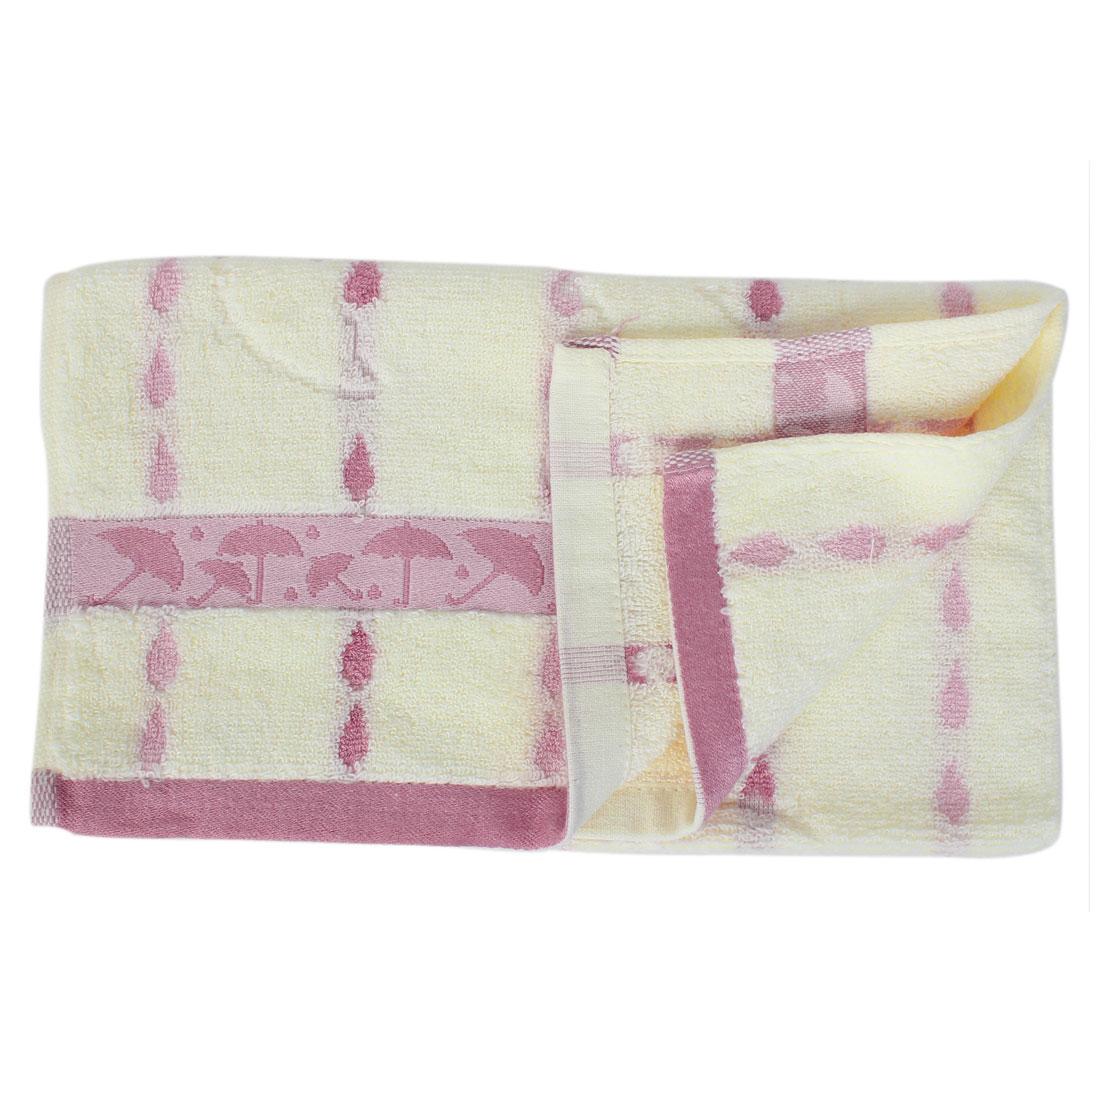 Terrycloth Drop Shape Washcloths Shower Bath Towel 72cm x 33cm Pink